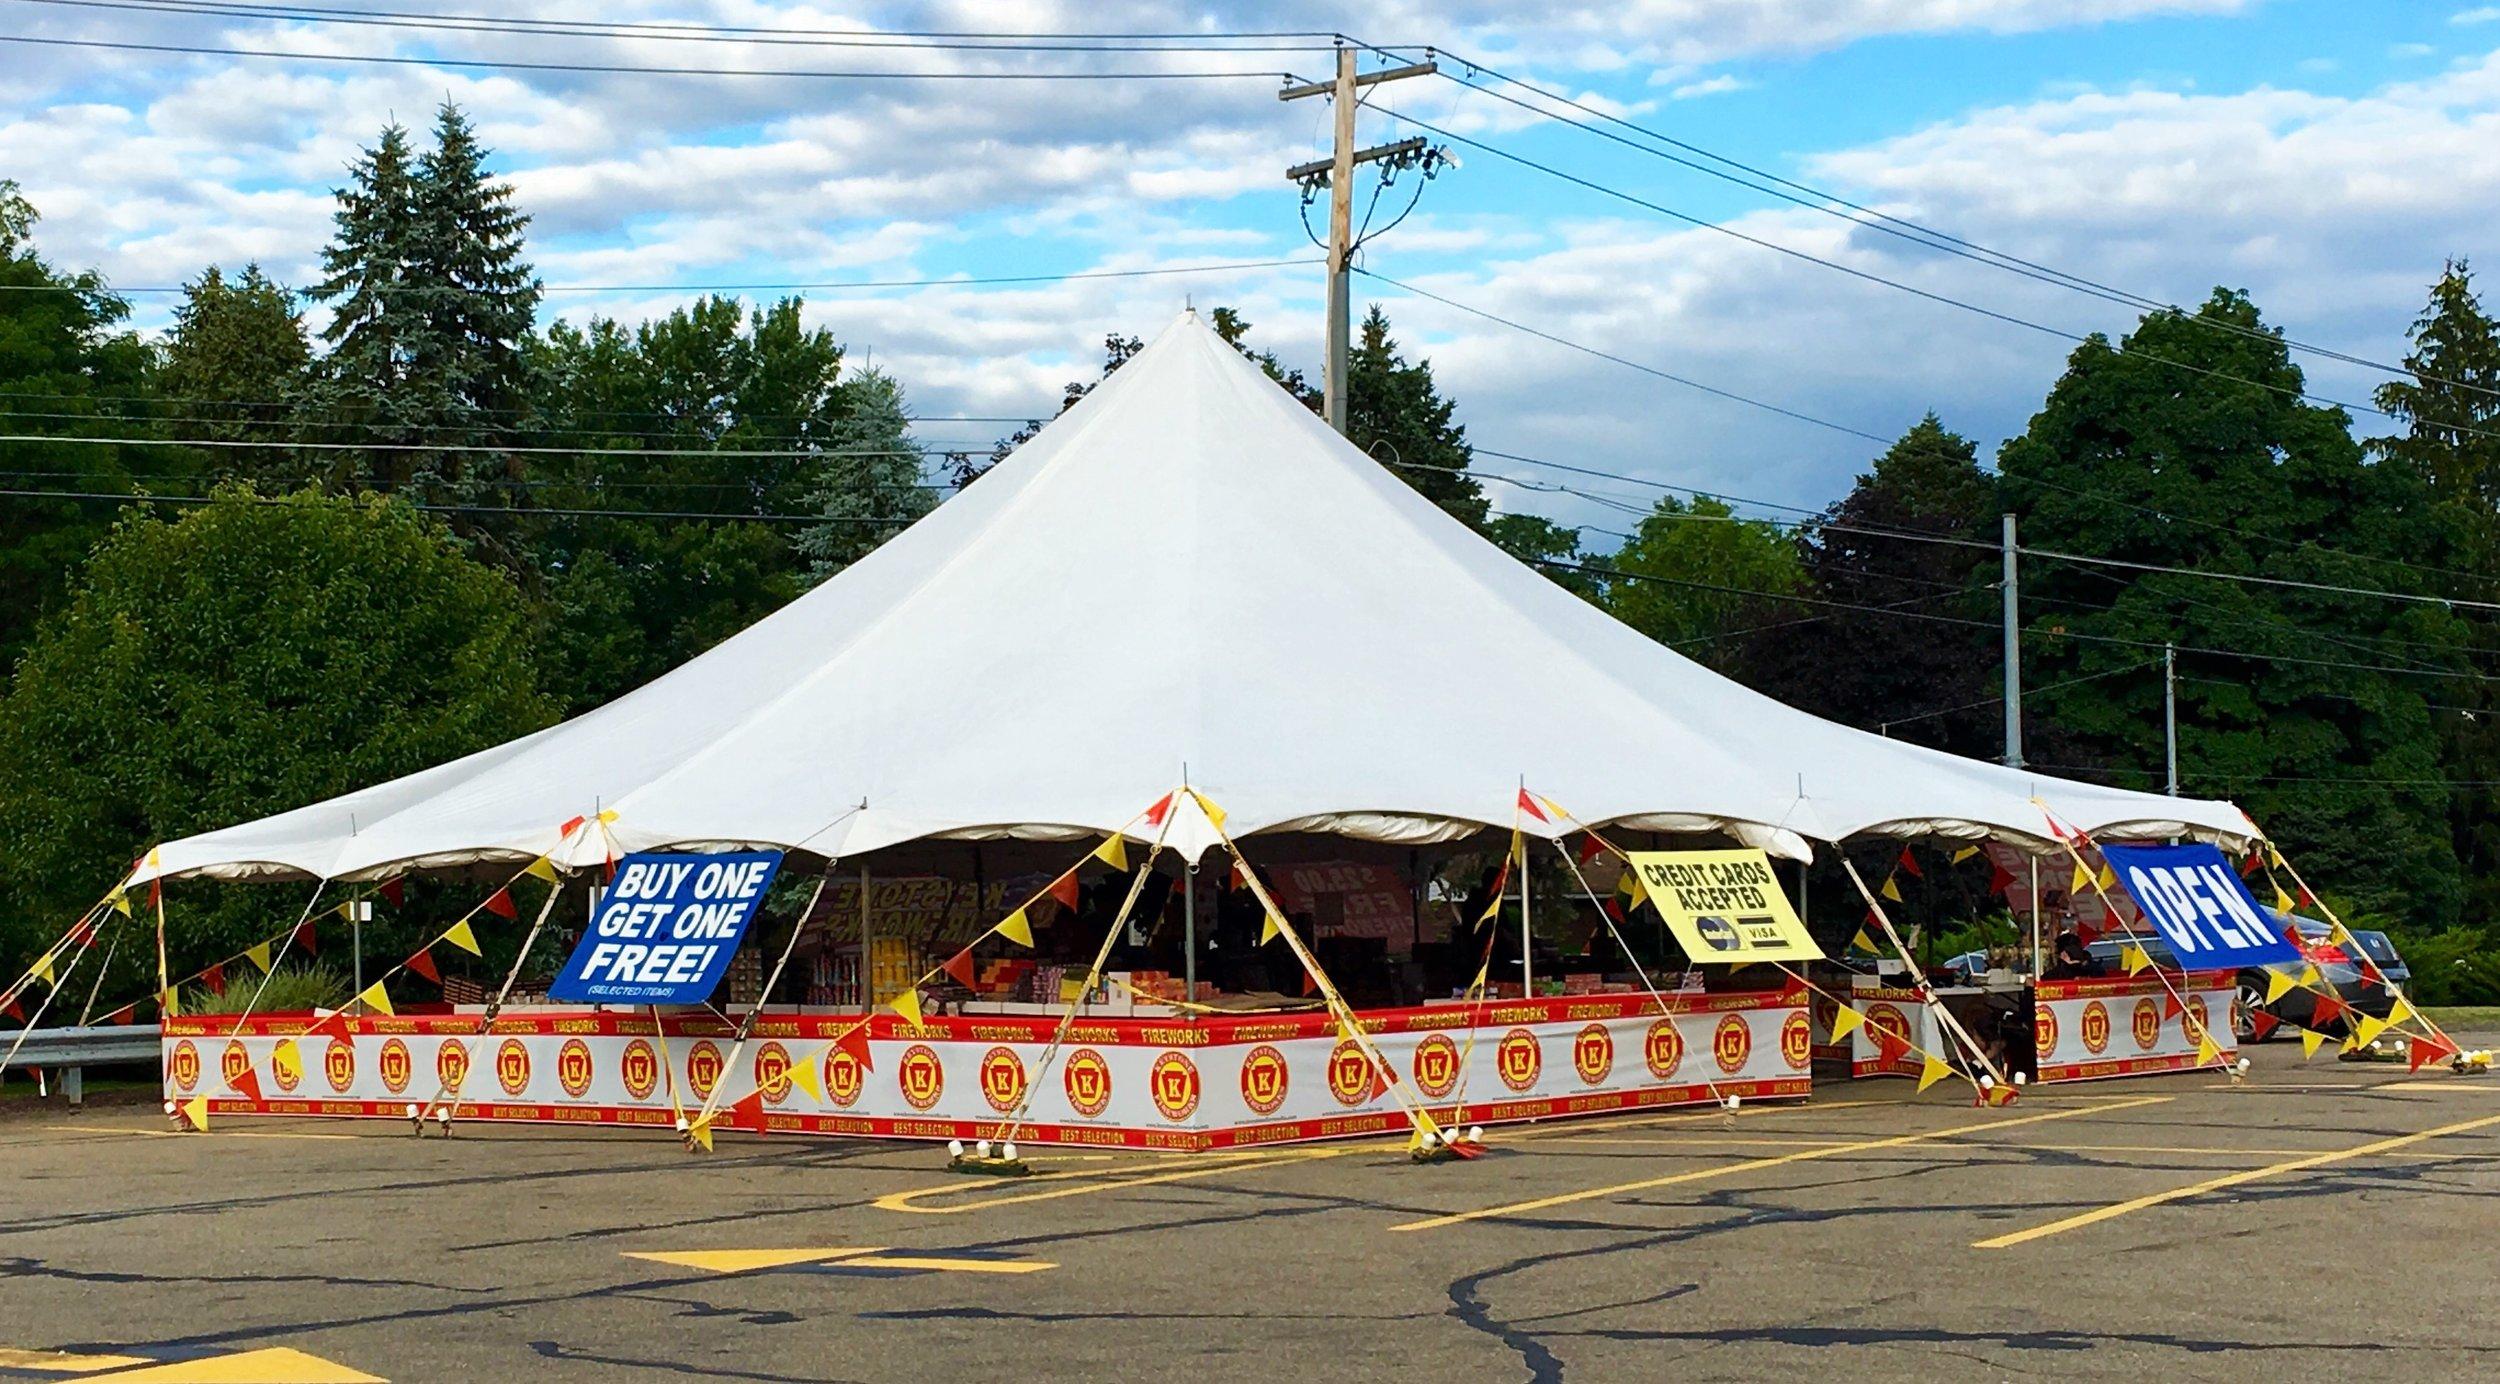 40' x 40' Large Pole Tent